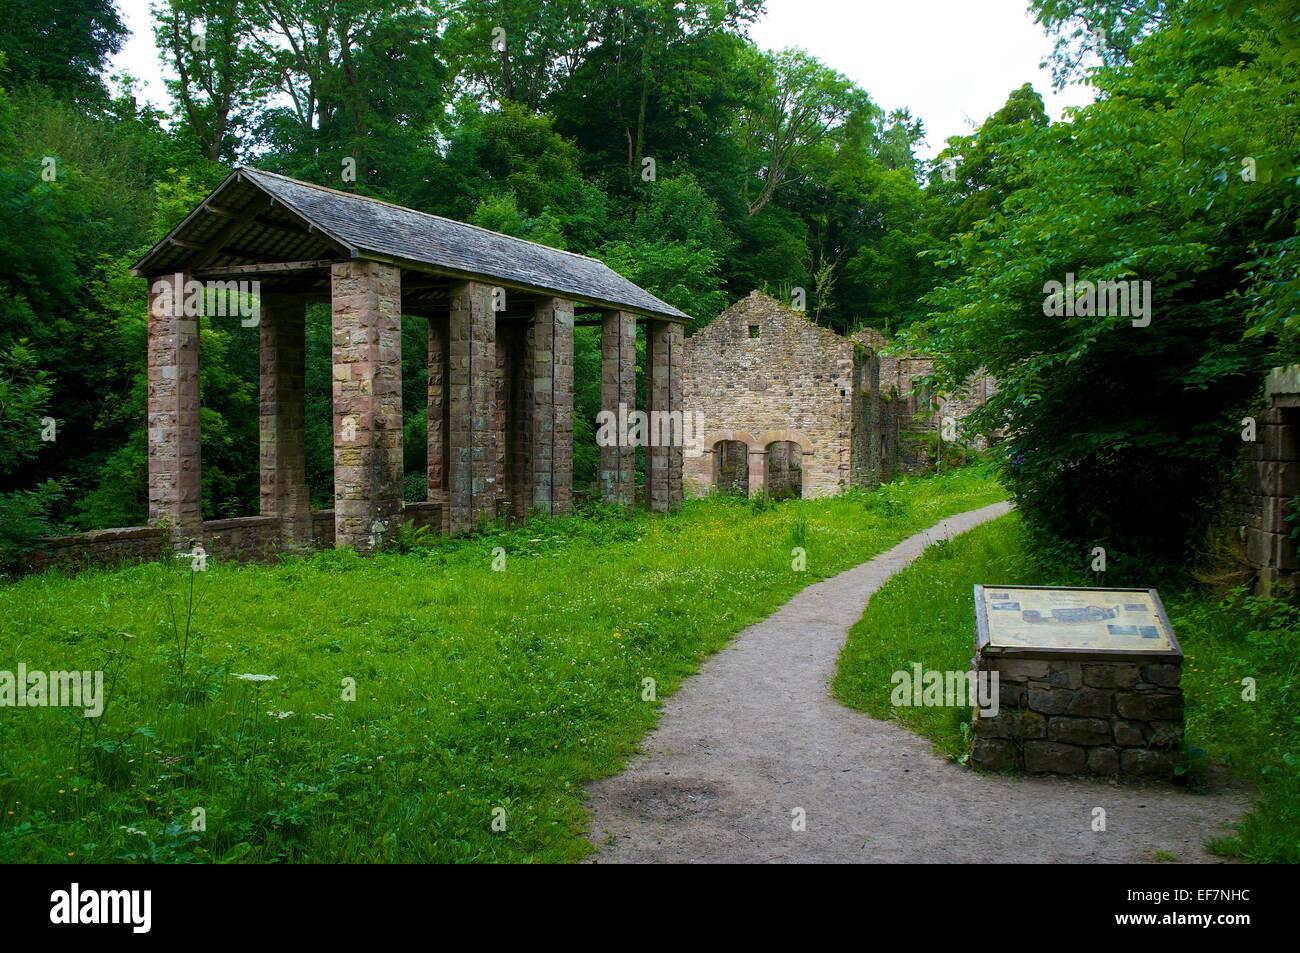 Bobbin Mill The Howk Calbeck Cumbria England UK. - Stock Image